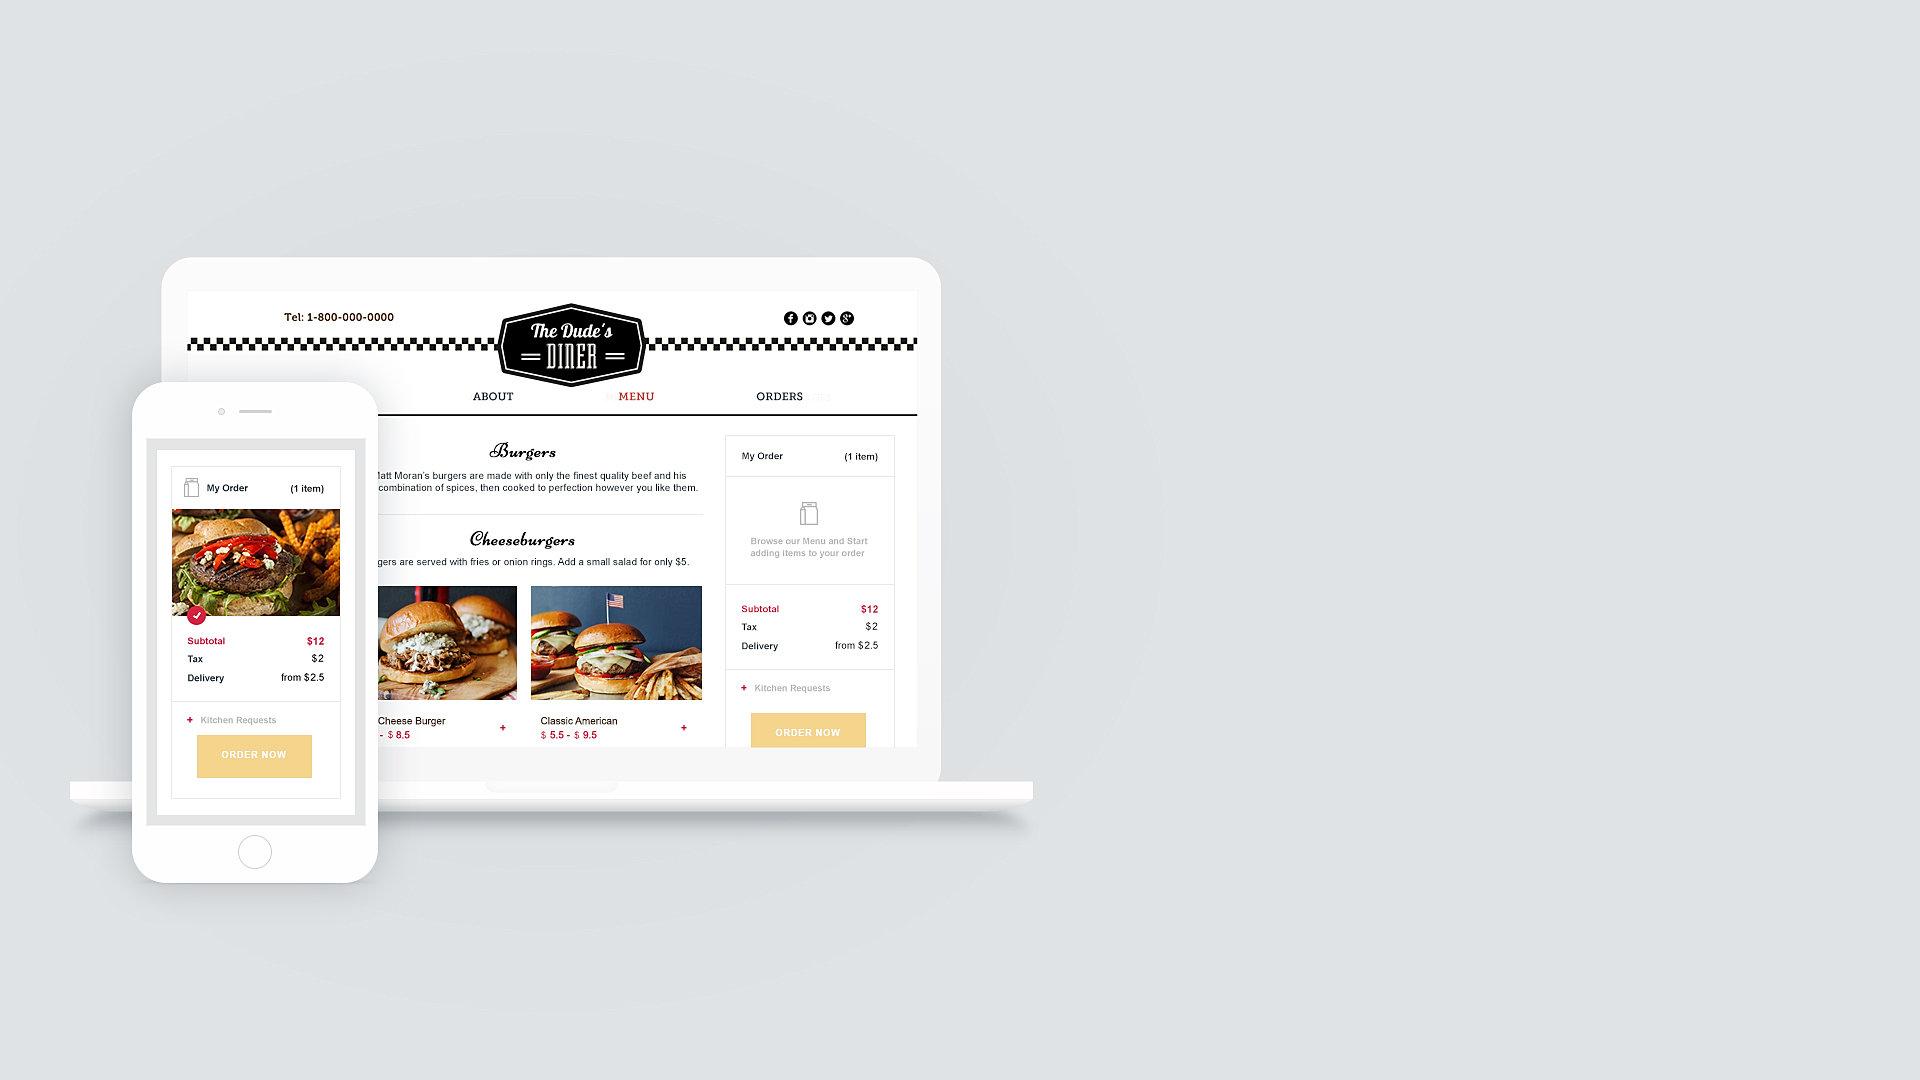 restaurant website builder online ordering system com online ordering made easy